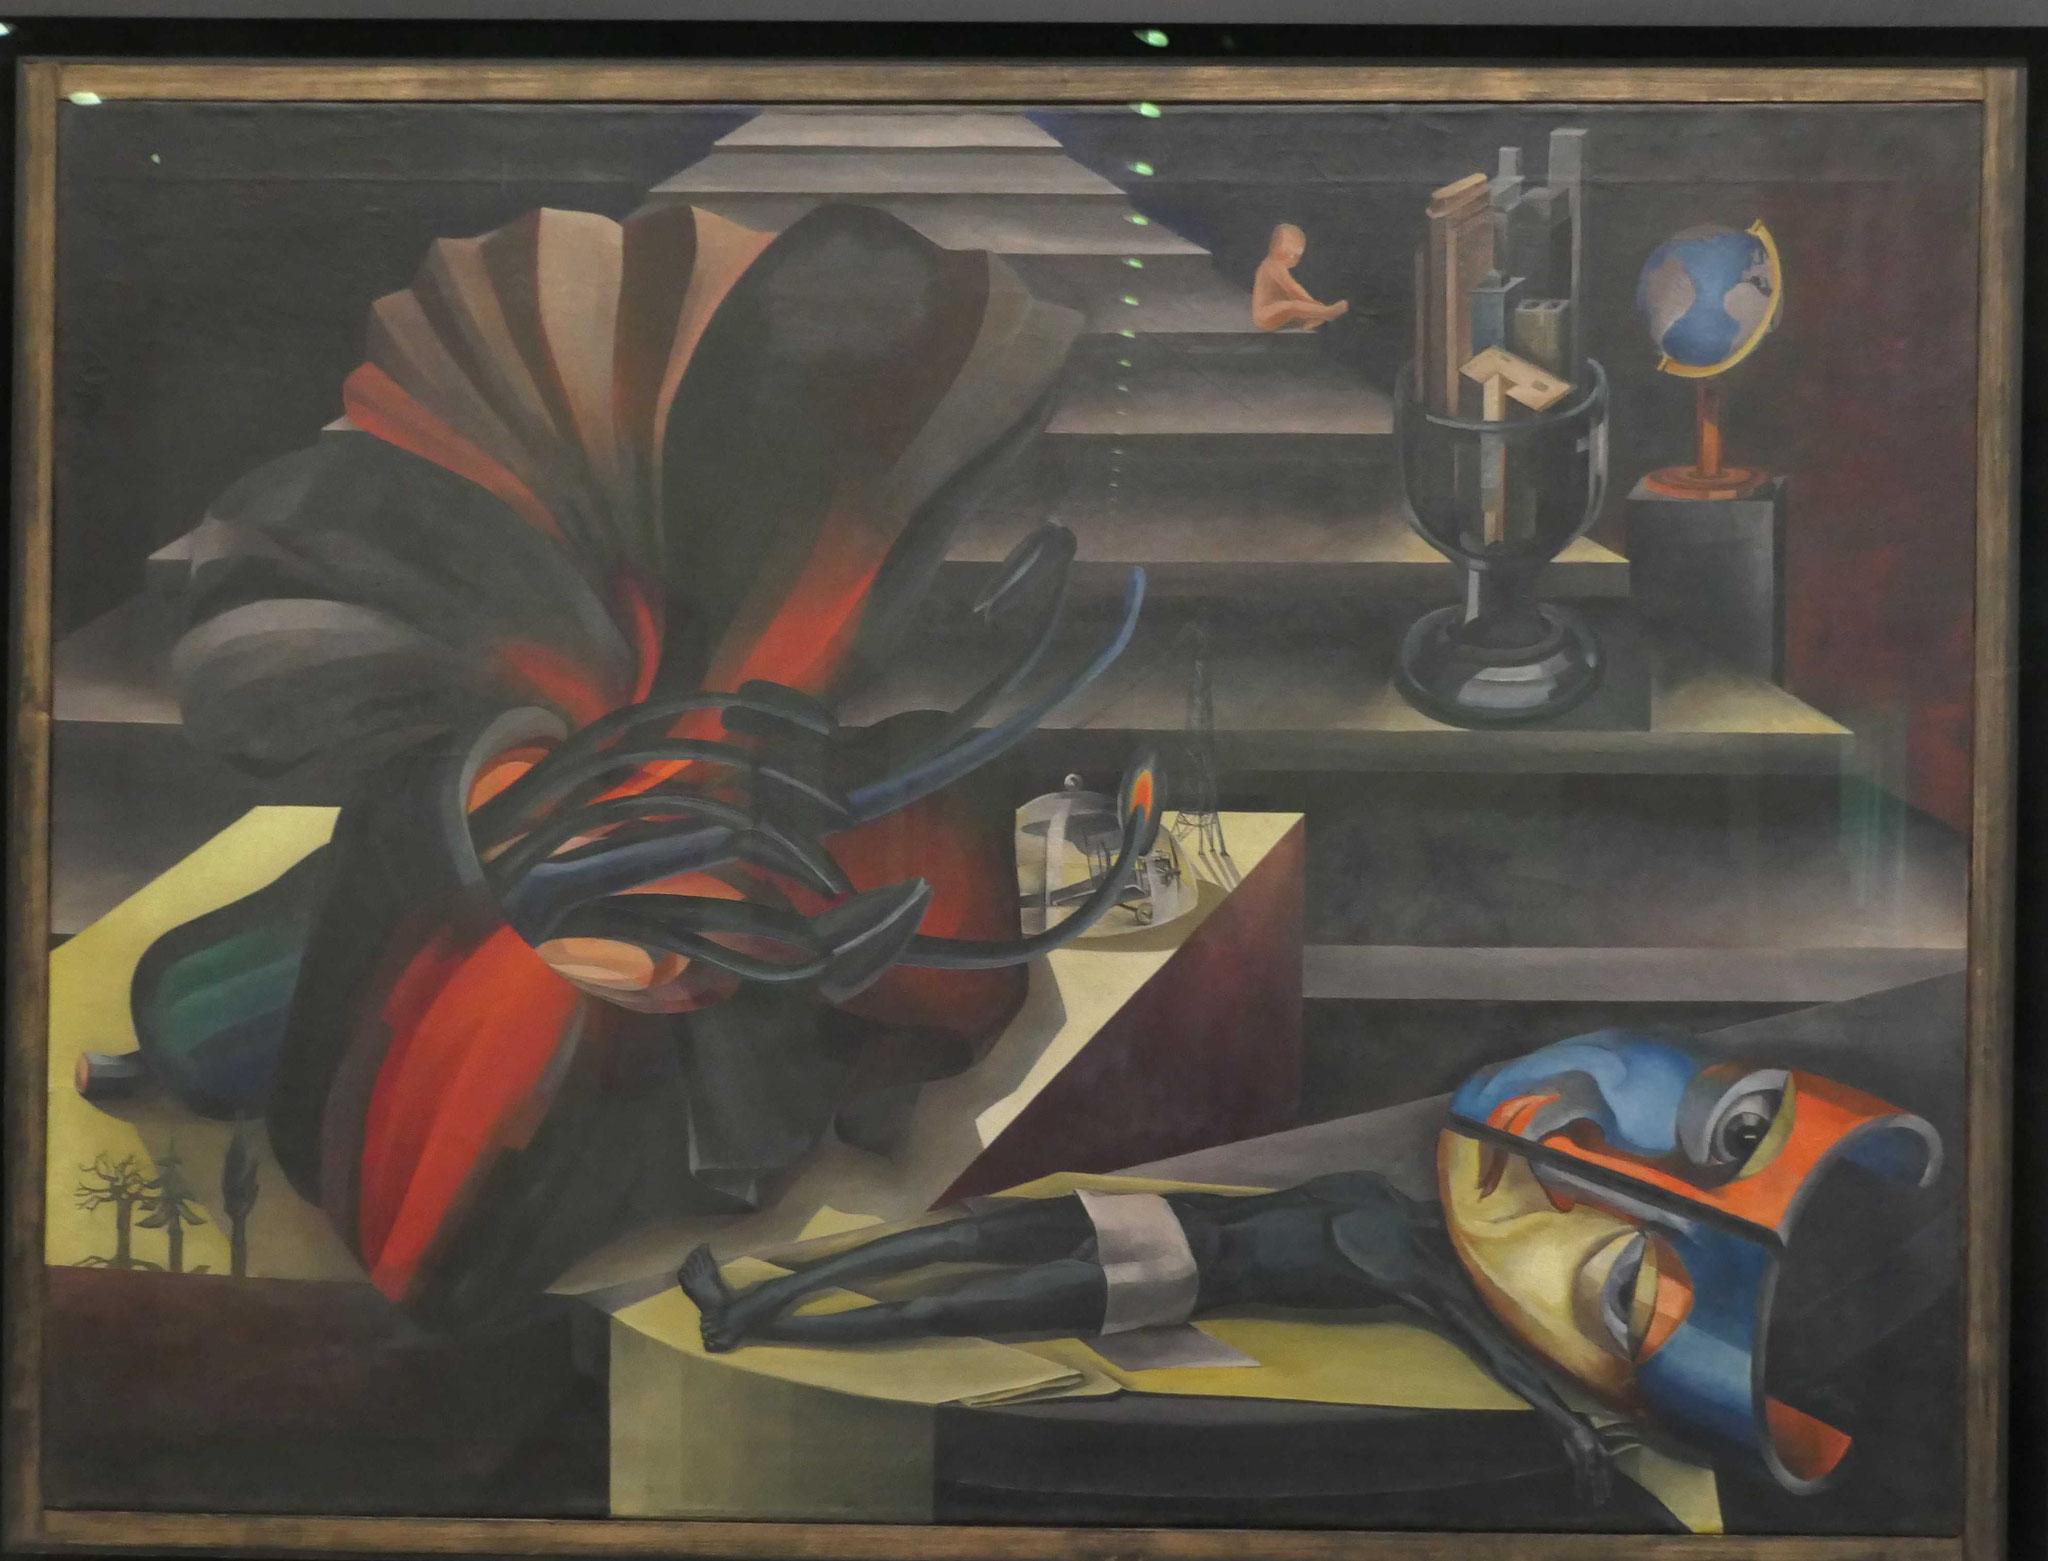 Hannah Höch, Die Treppe, 1923-26, Neue Nationalgalerie Berlin